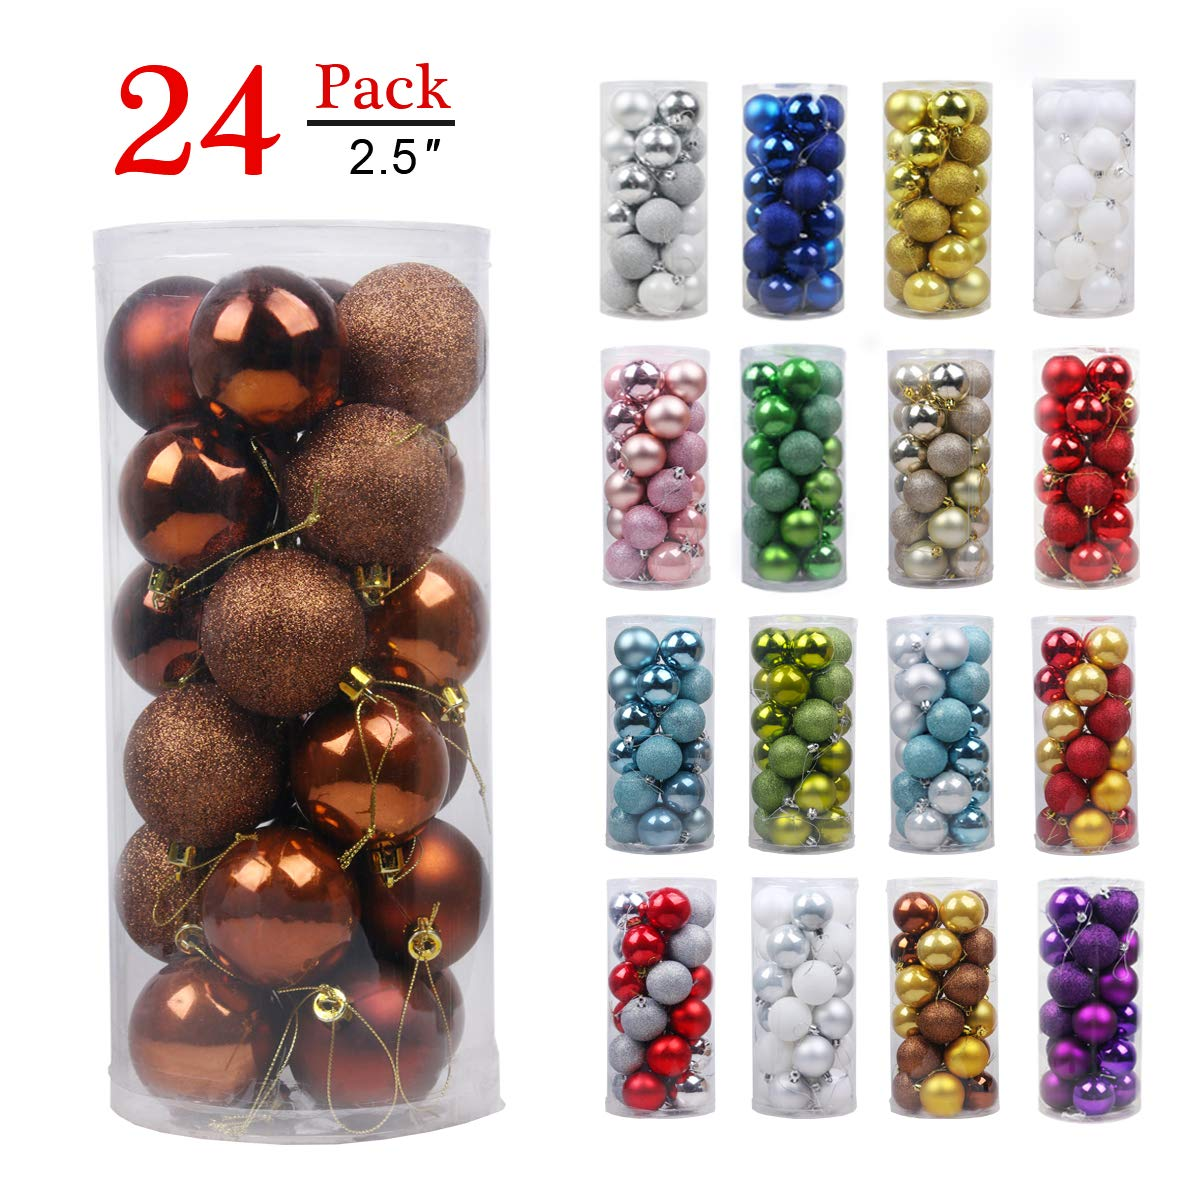 Christmas Balls Ornaments for Xmas Tree-Shatterproof Christmas Tree Decorations Large Hanging Ball Bronze 2.5''